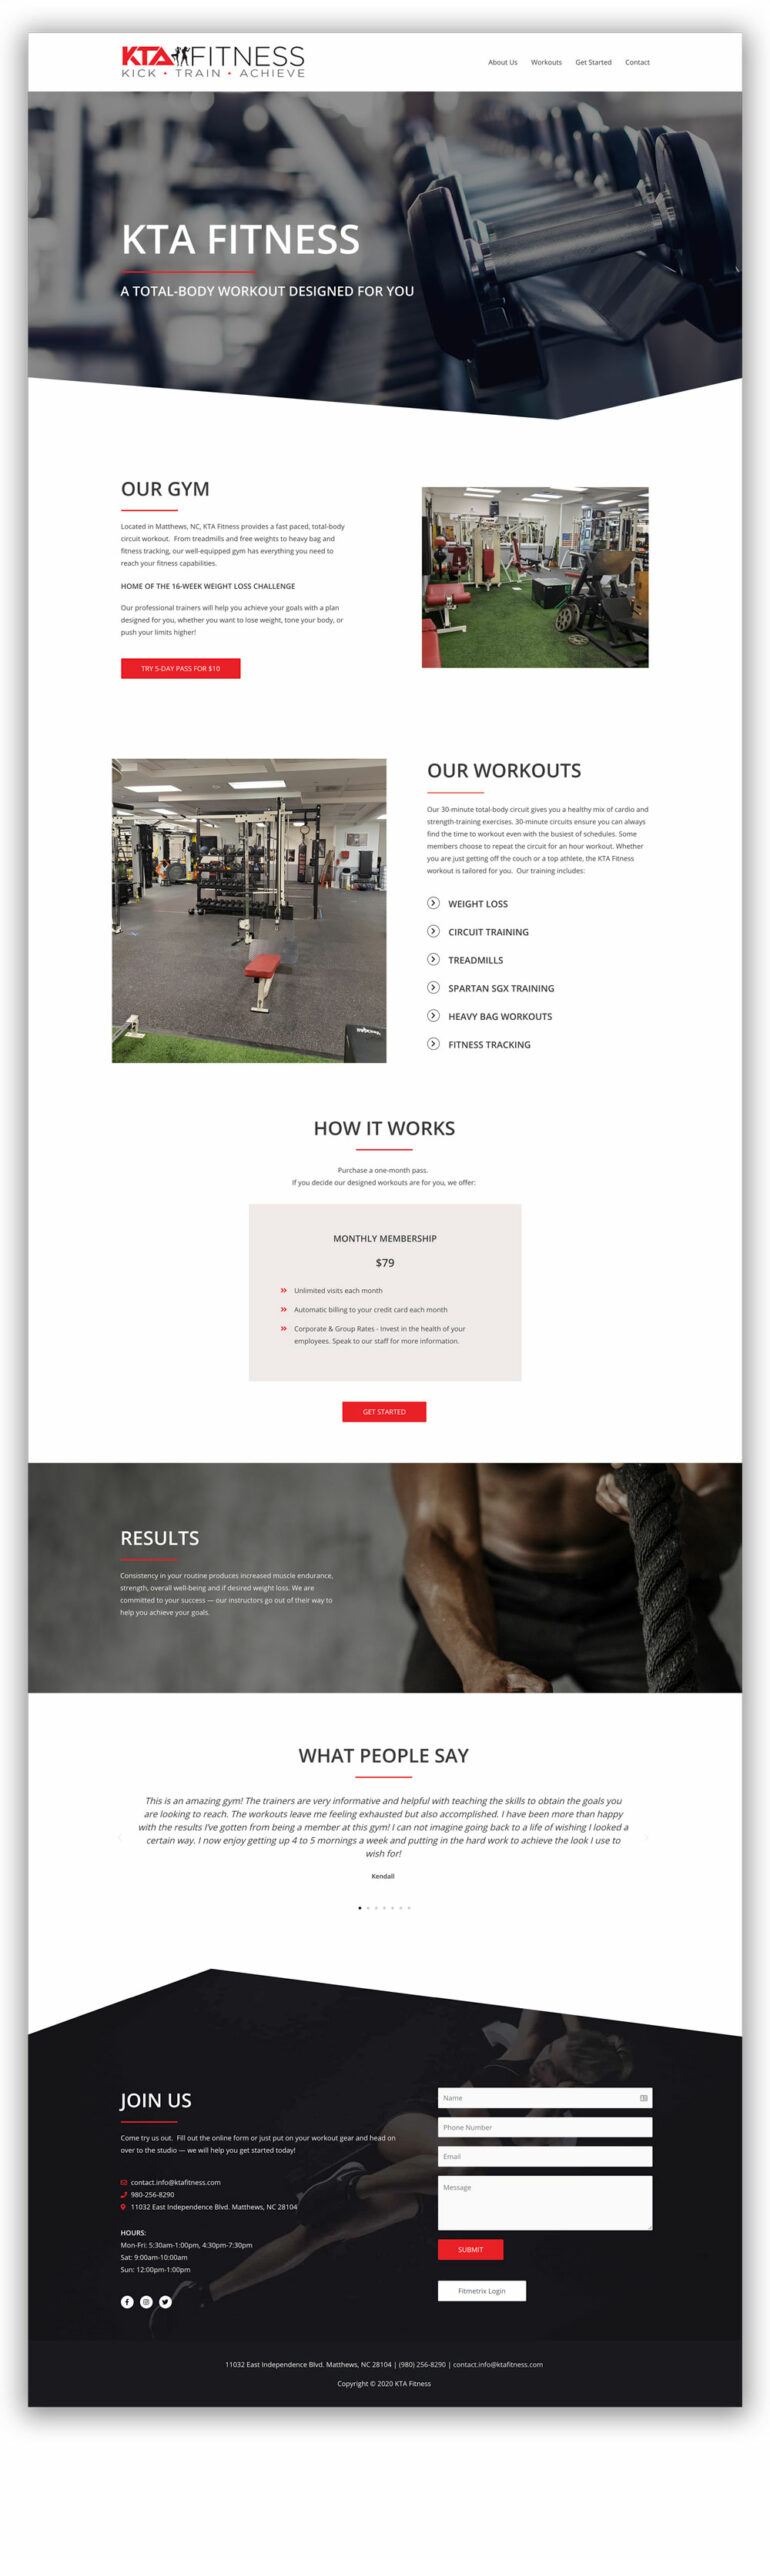 KTA Fitness